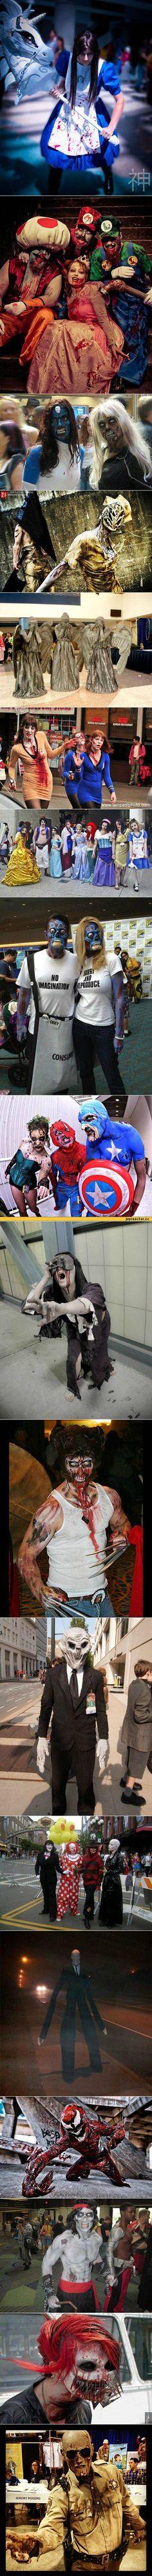 Zombified cosplay